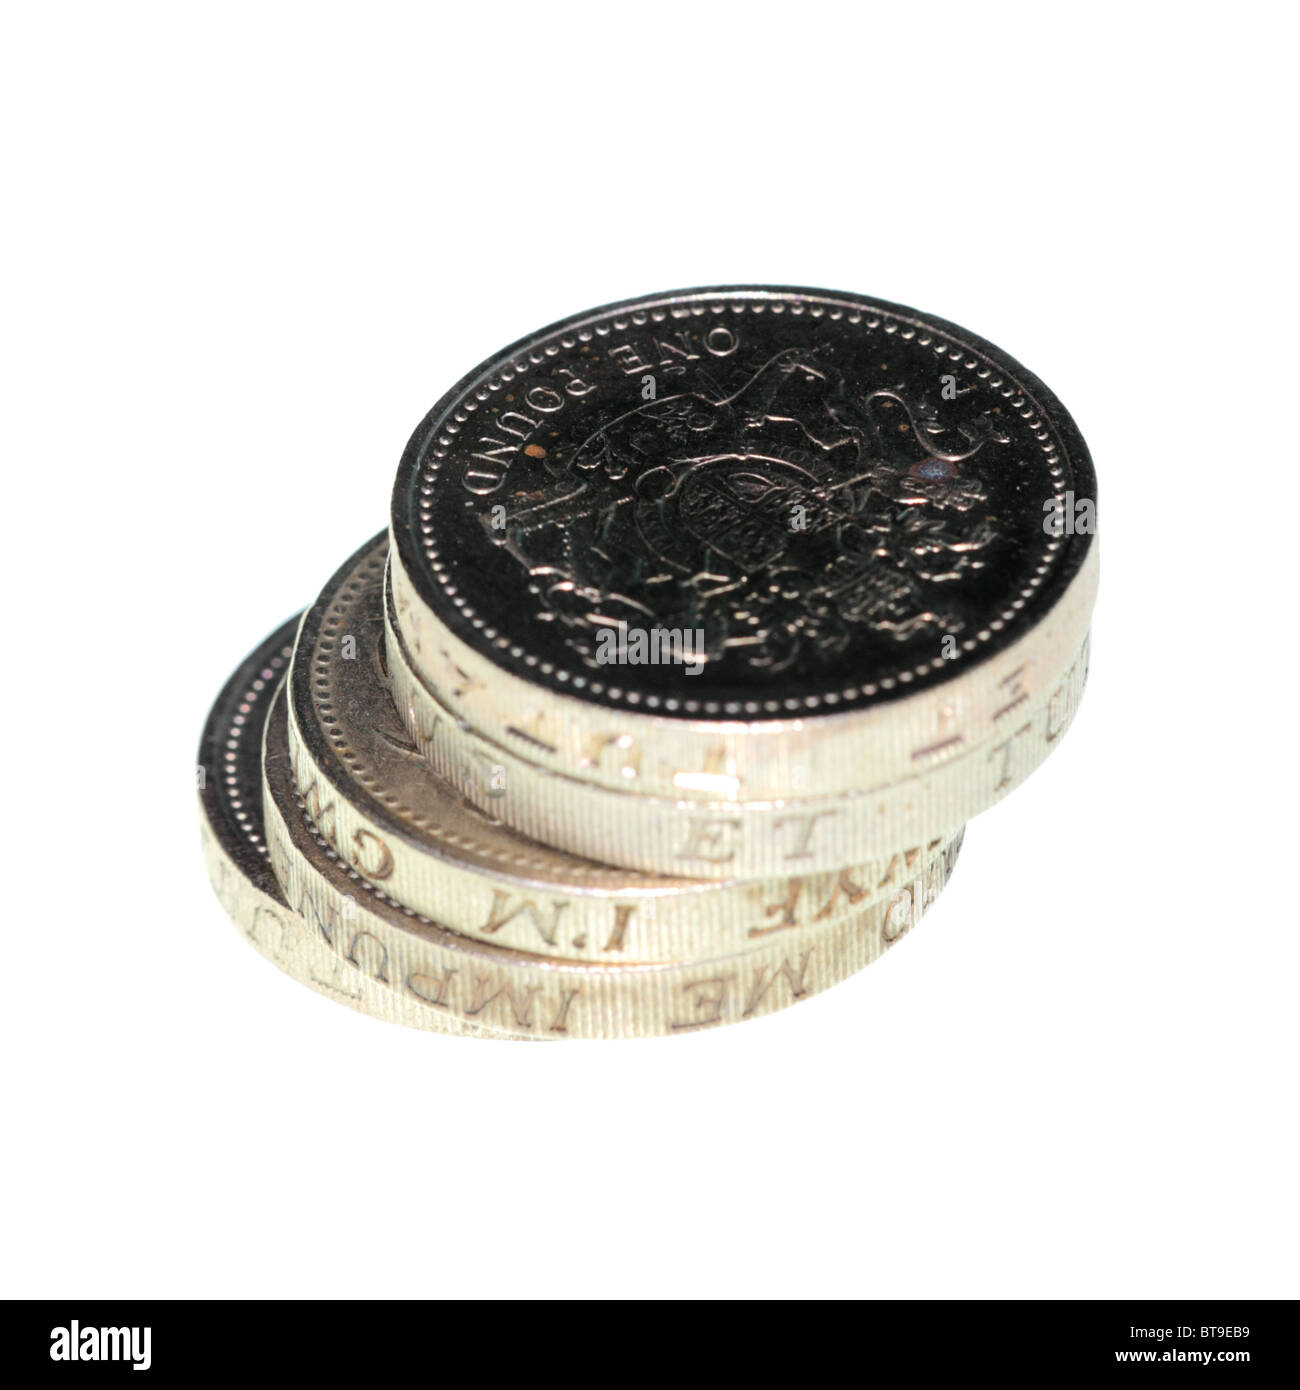 pound coins - Stock Image